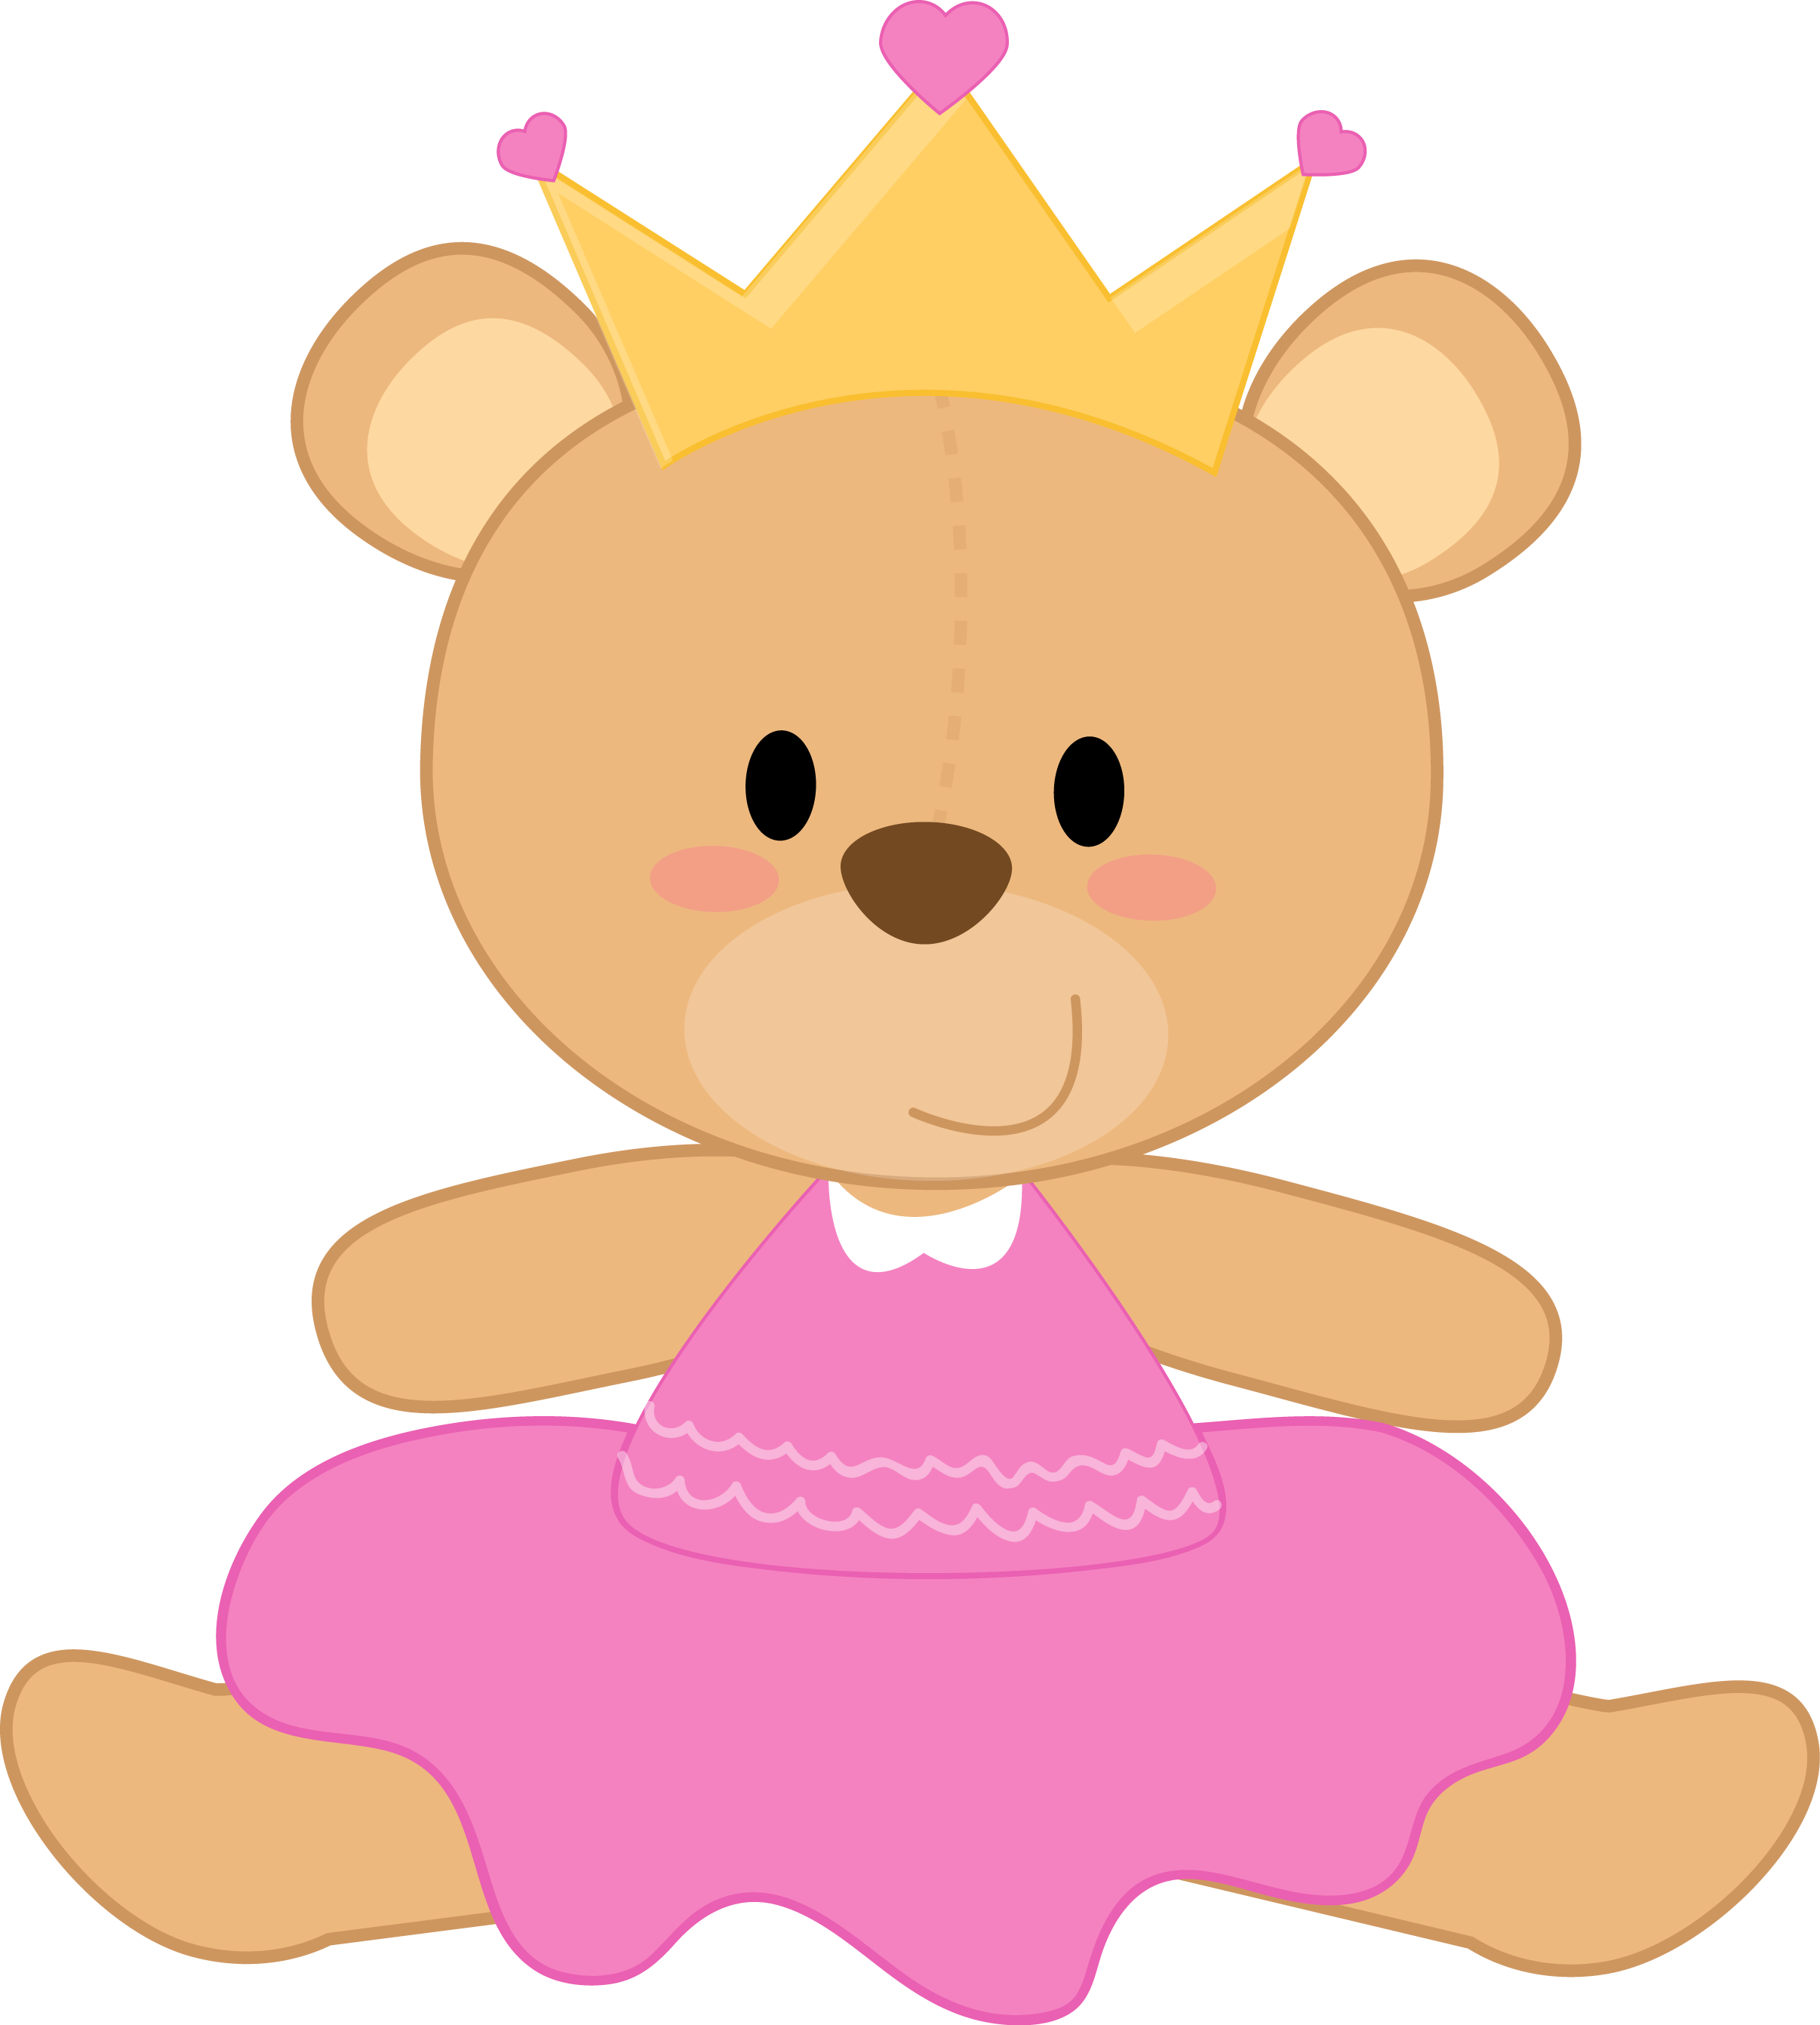 CH.B *✿* PRINCESAS DE CUENTO ✿ | dibujos de osos | Pinterest ...